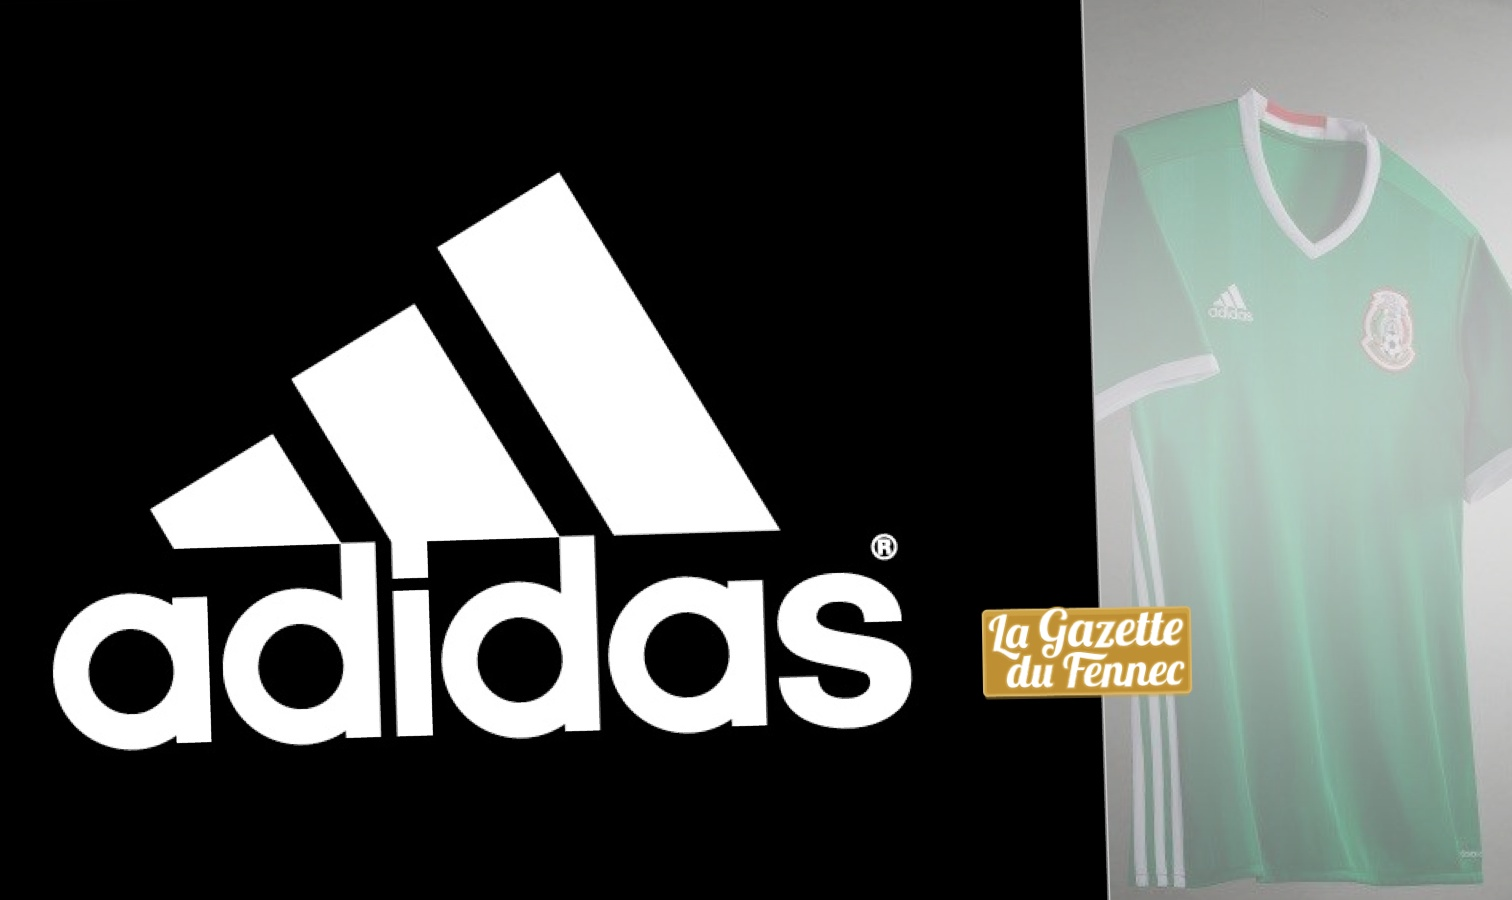 maillot algerie noir adidas jusqu à 60% www.citroen-barre.com ! 8efb367dd51